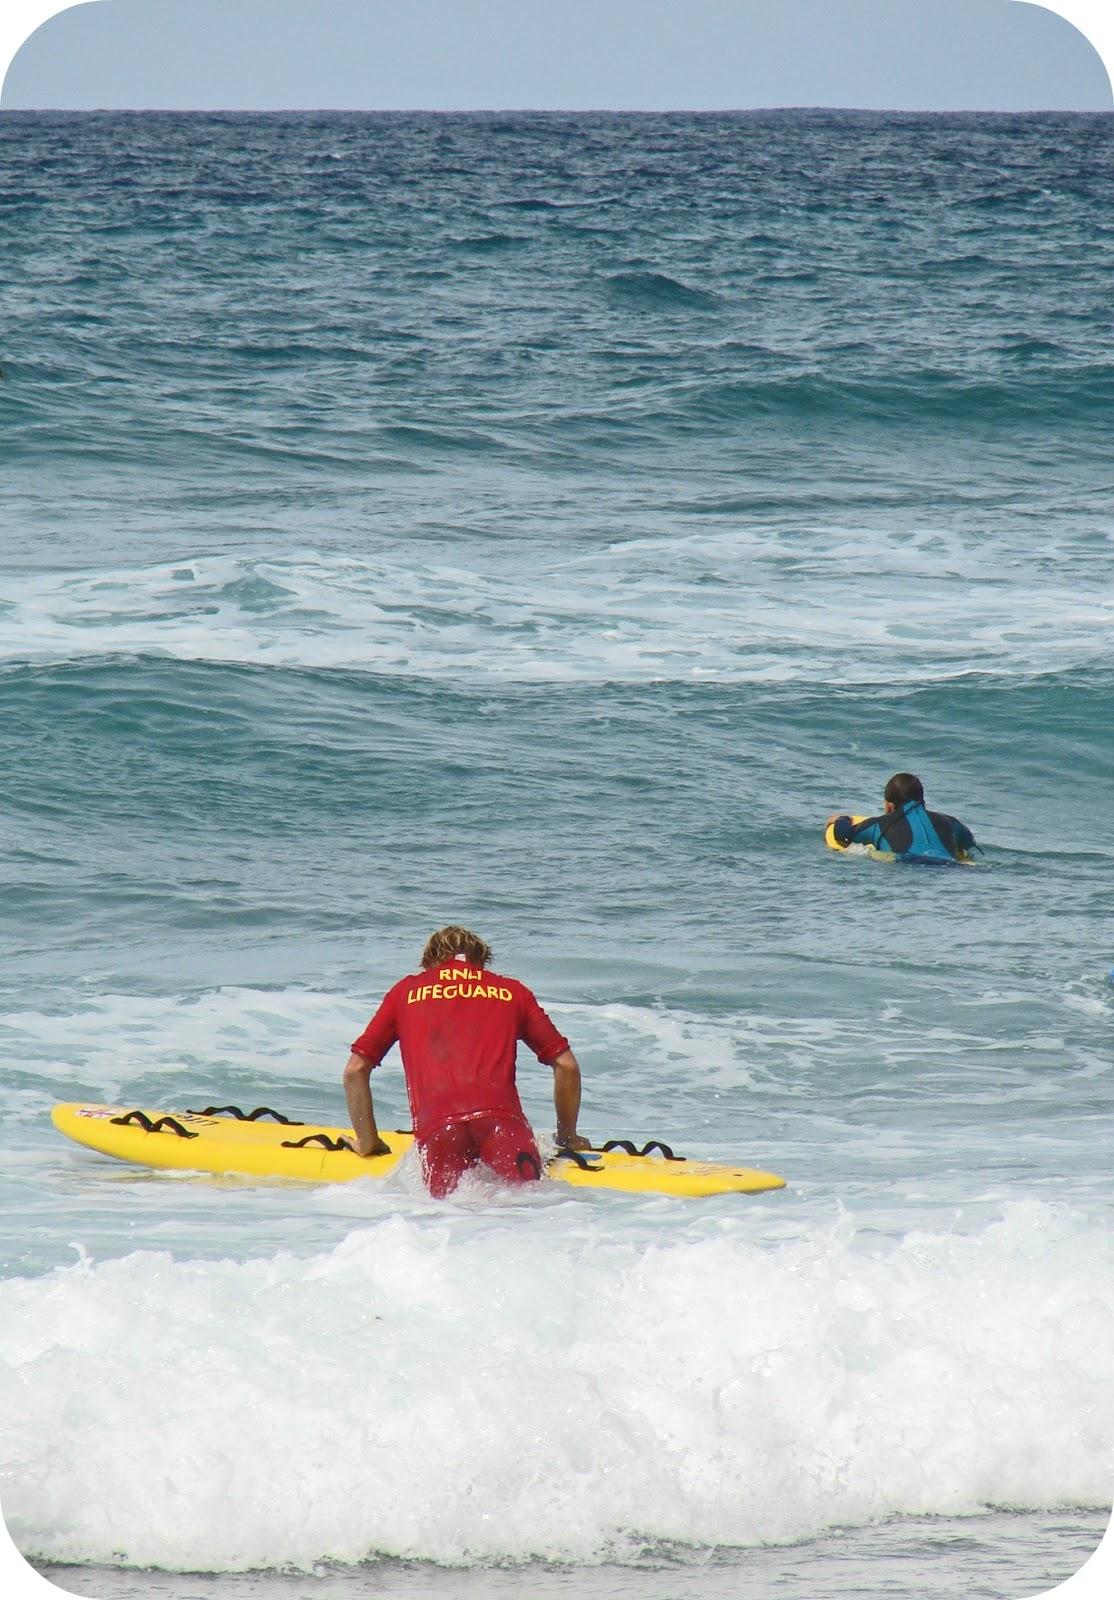 Newquay RNLI Lifeguard